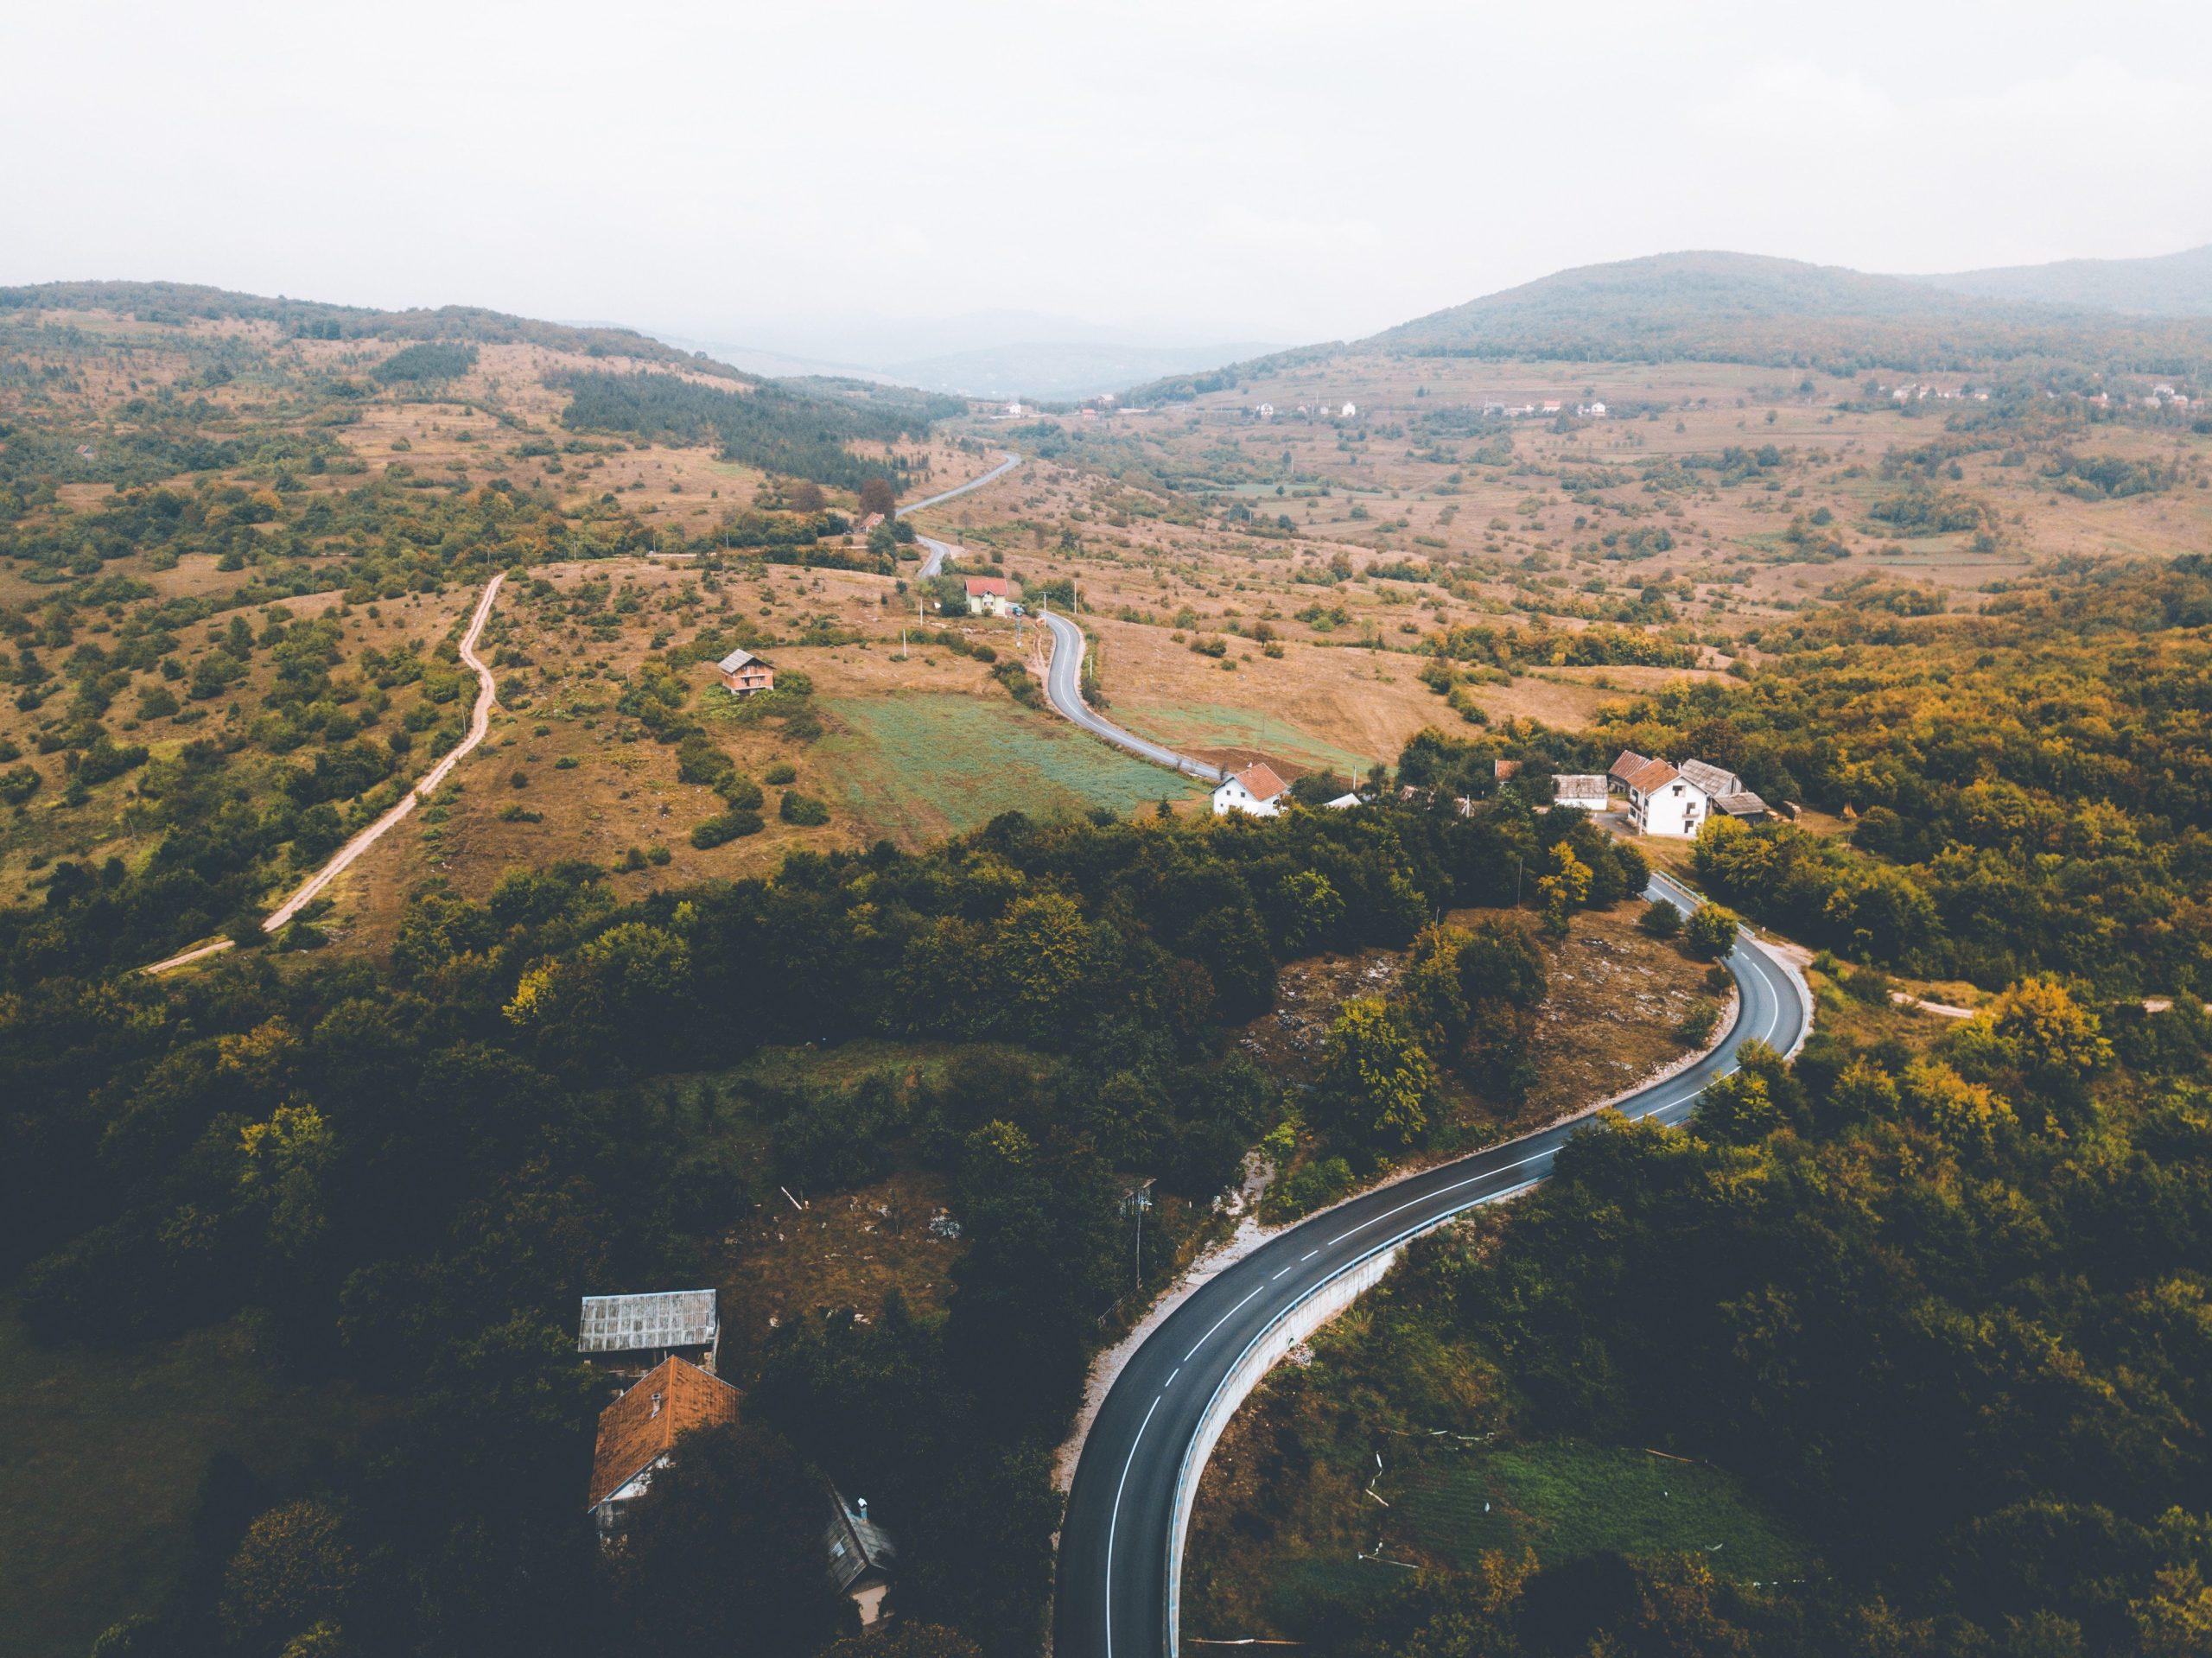 Croatia to receive over €86m for broadband infrastructure development